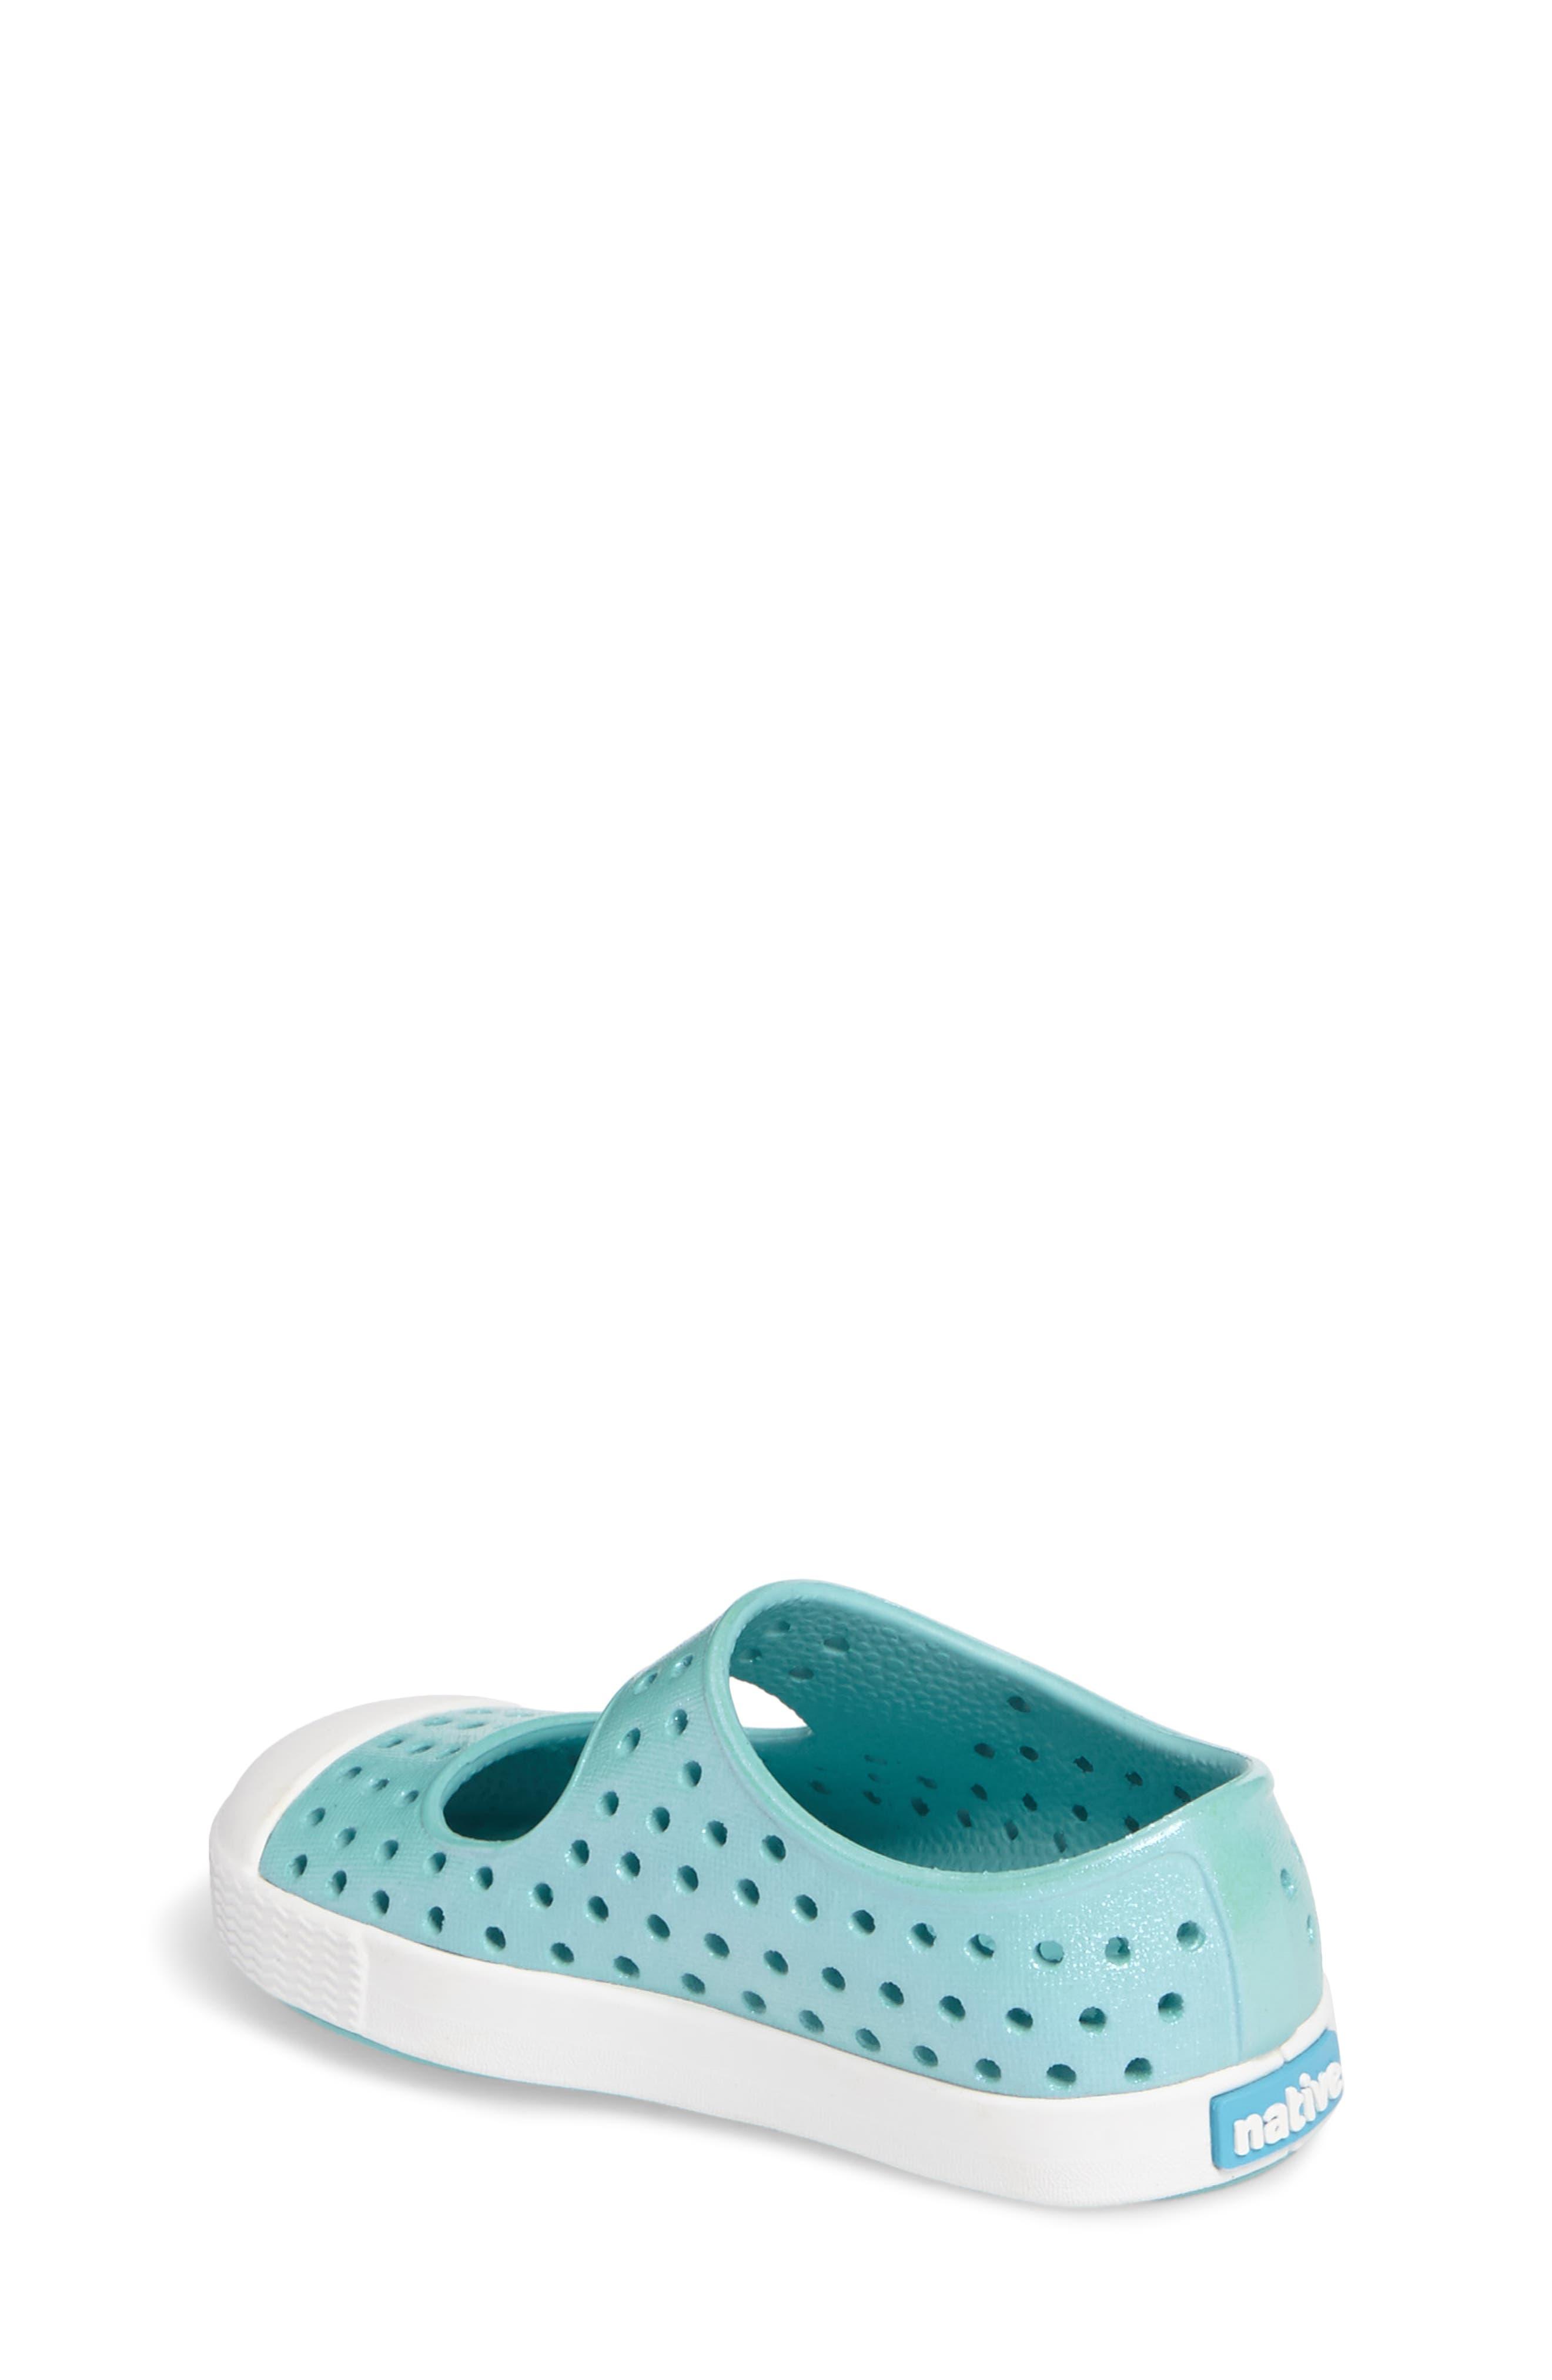 Alternate Image 2  - Native Shoes Juniper Perforated Mary Jane (Baby, Walker, Toddler & Little Kid)